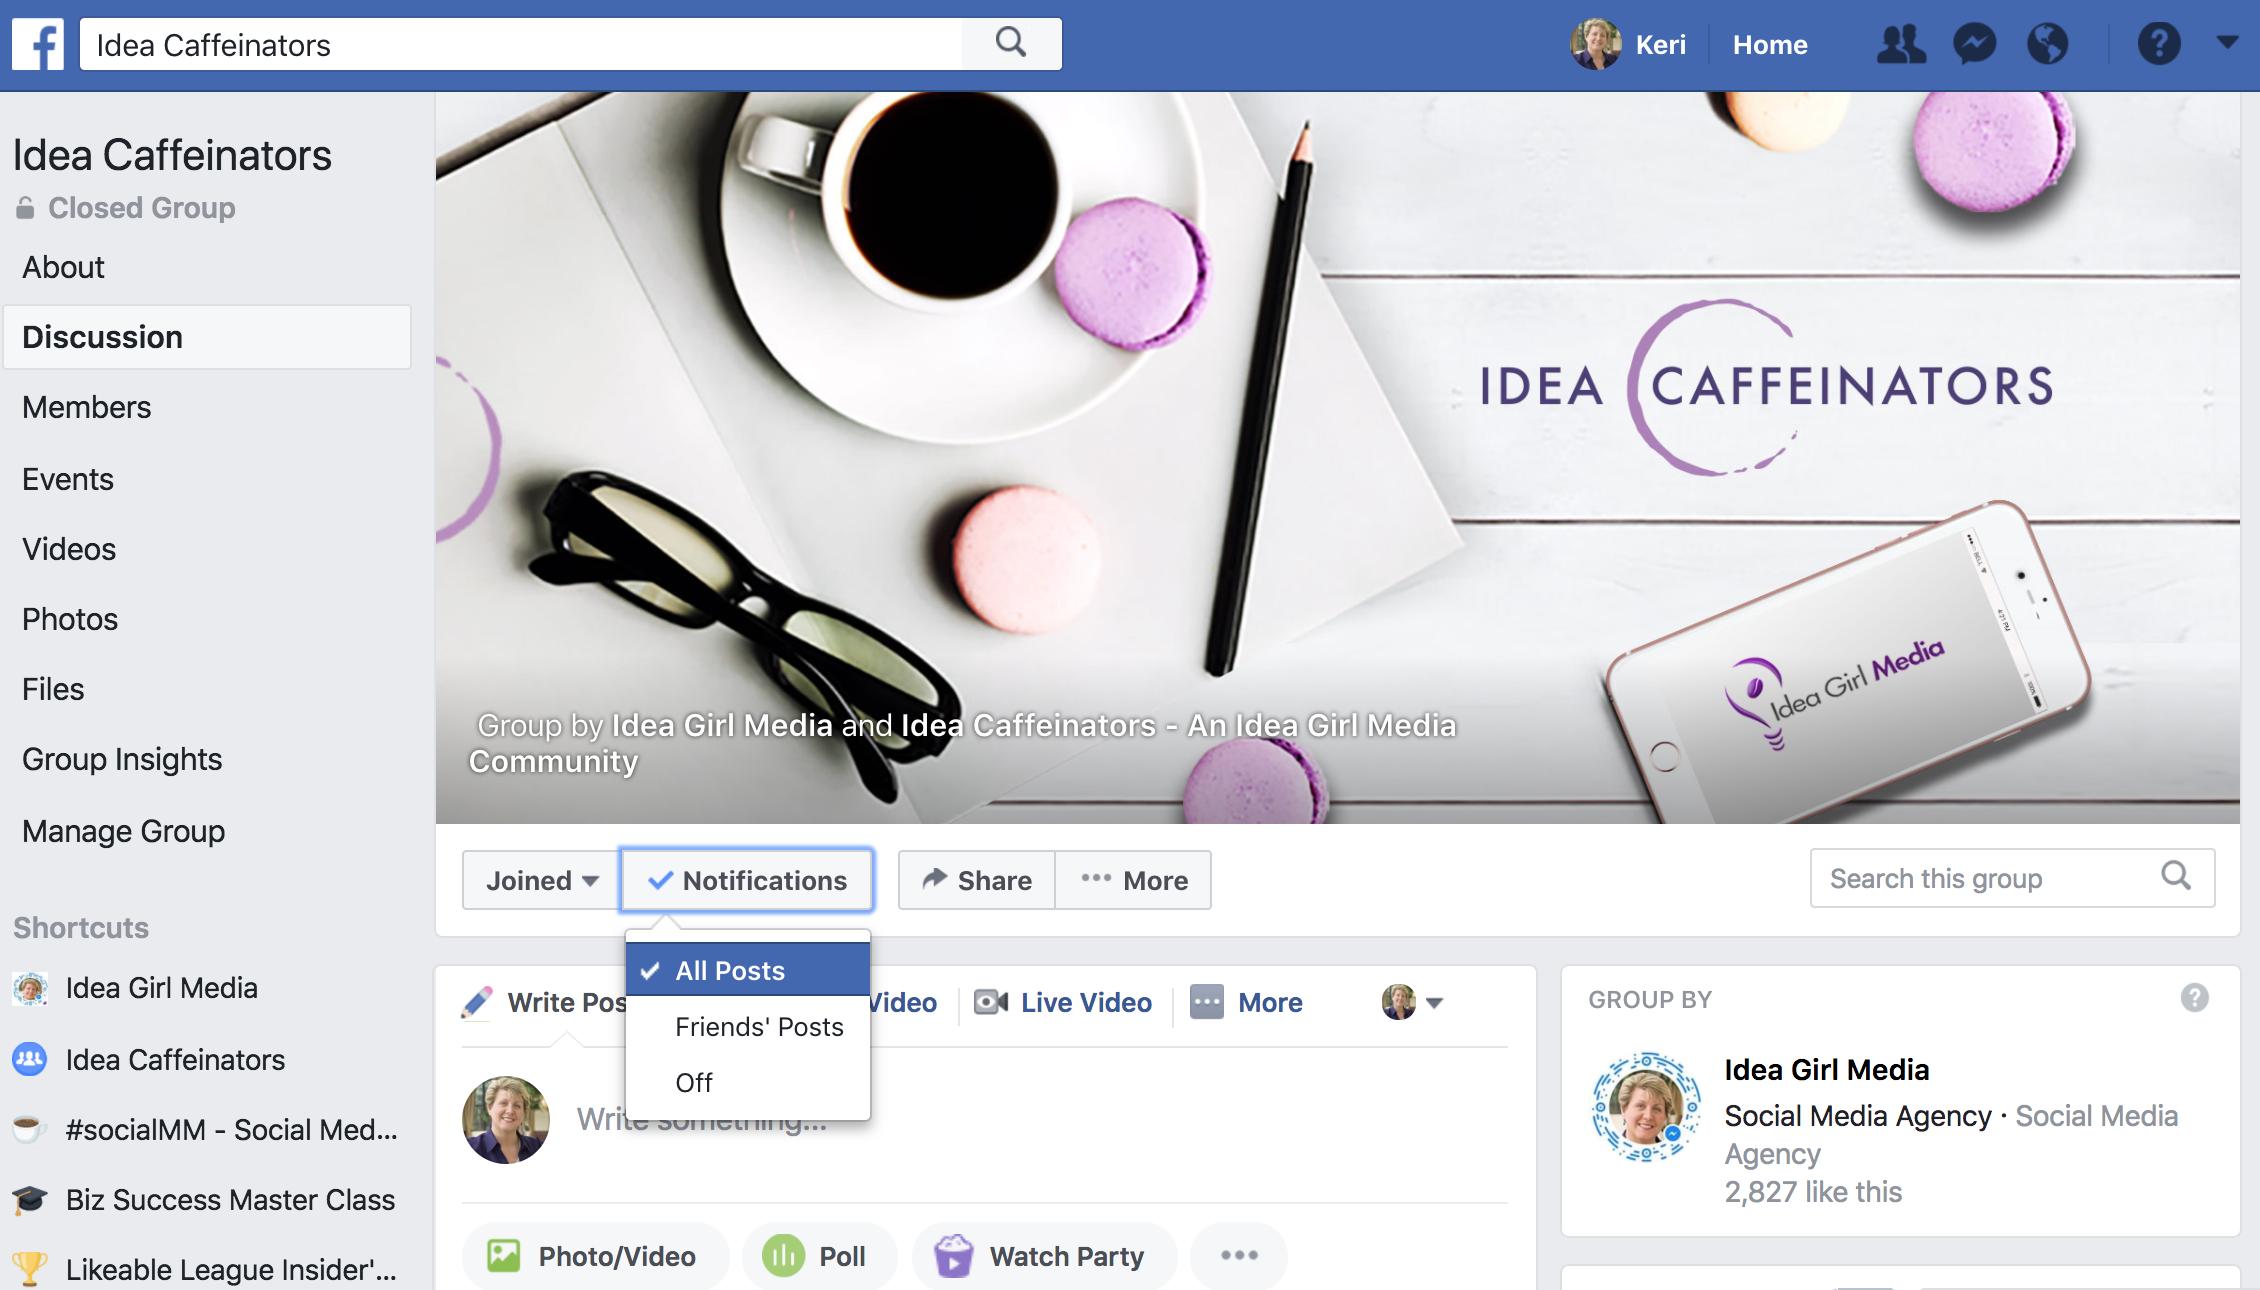 Keri Jaehnig shows you how to help members See All Facebook Groups Posts Via The New Facebook Algorithm at ideagirlmedia.com